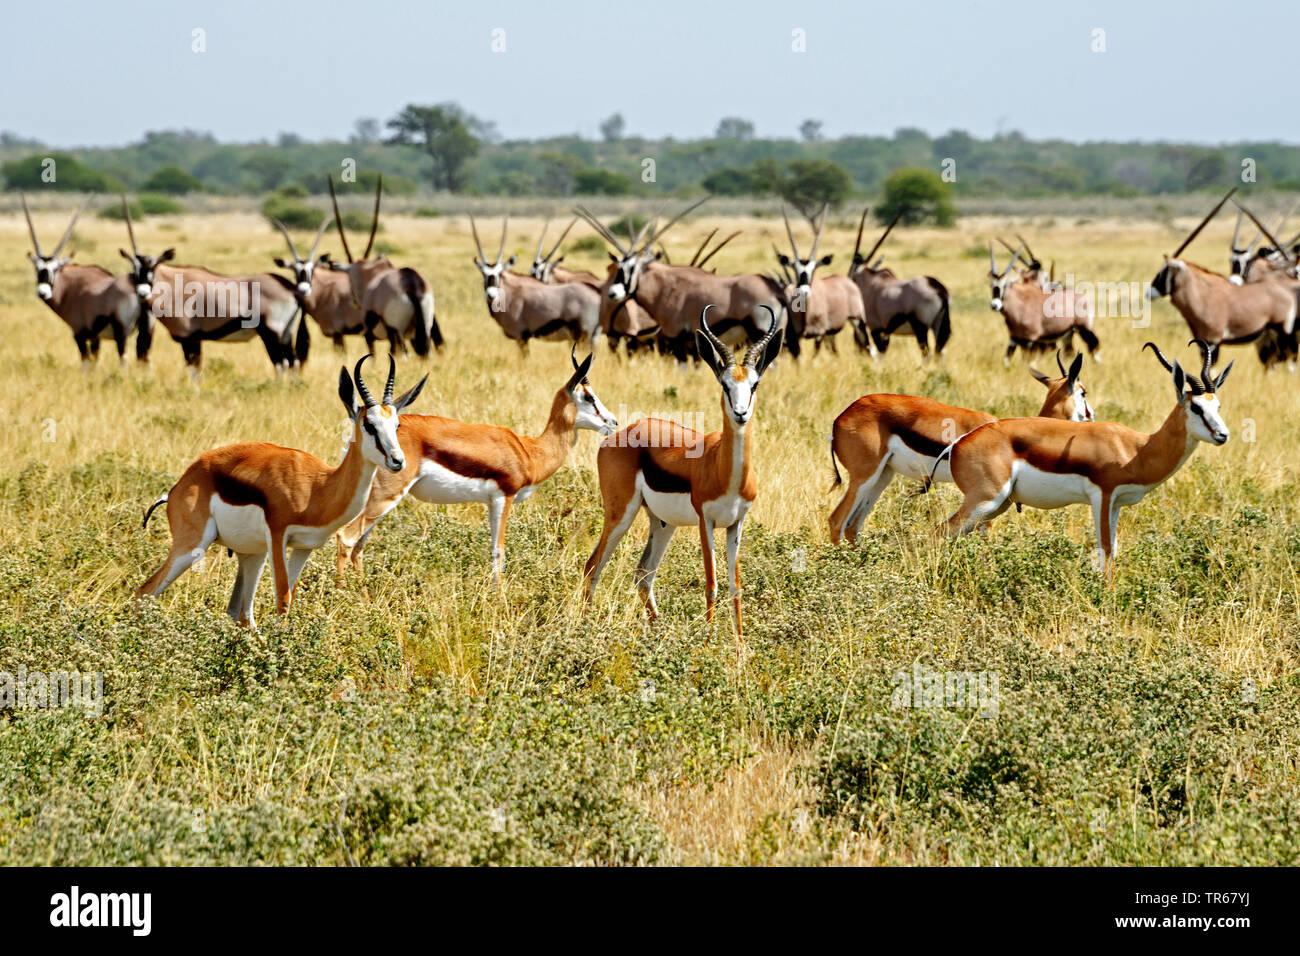 springbuck, springbok (Antidorcas marsupialis), herds of springbucks and gemsbucks in savanna, Botswana, Central Kalahari Game Reserve, Deception Valley - Stock Image